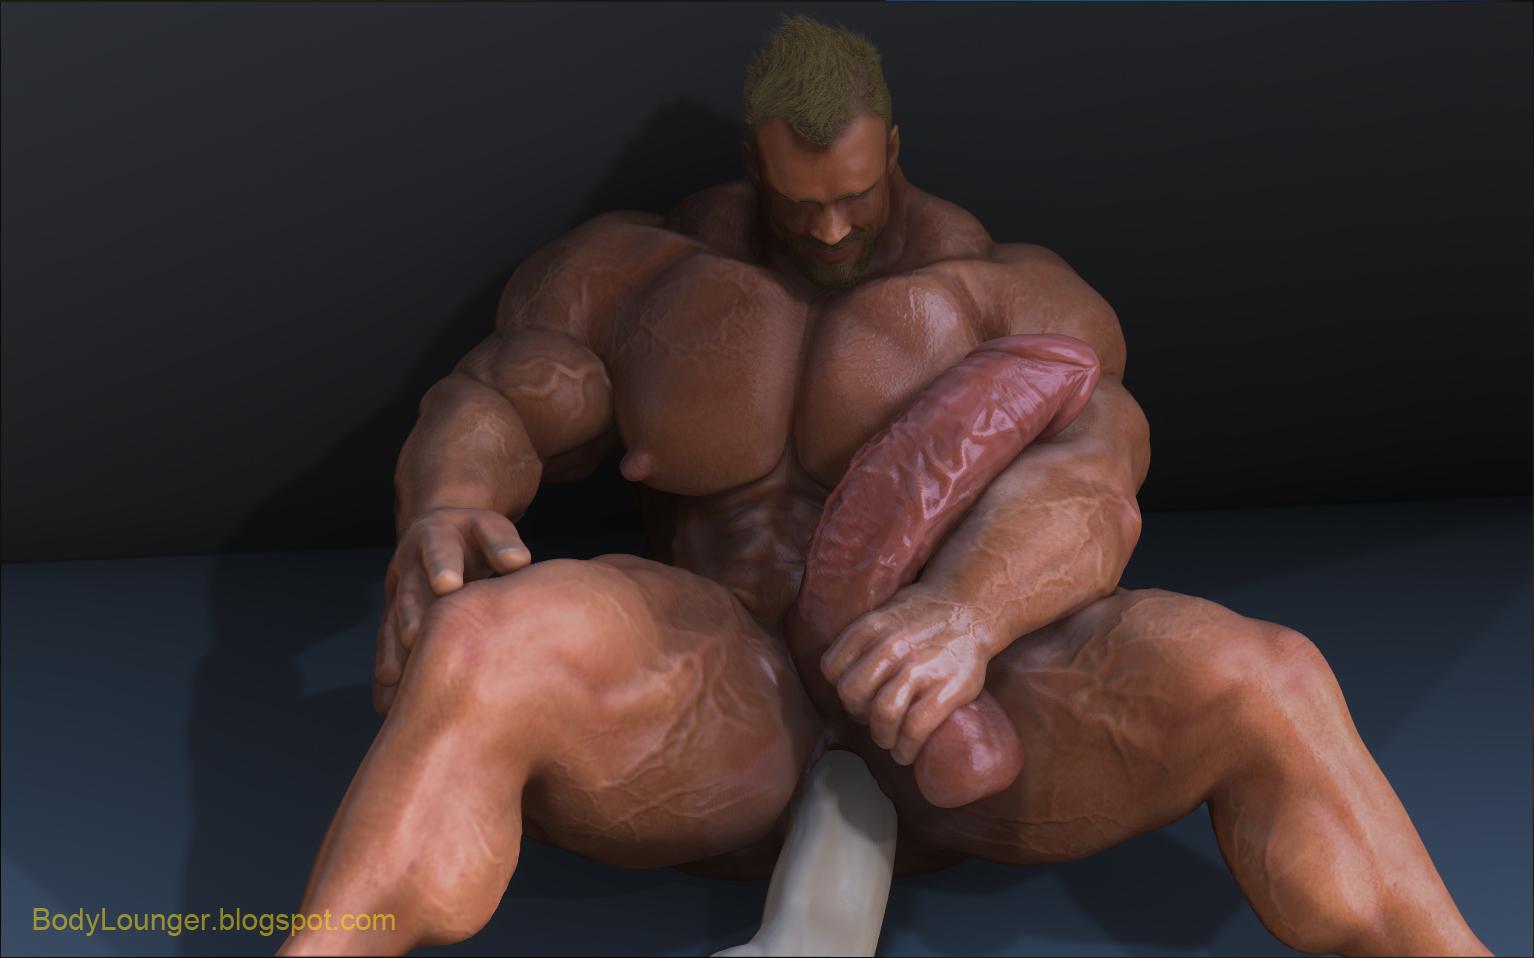 gay fisting bodybuilder escort